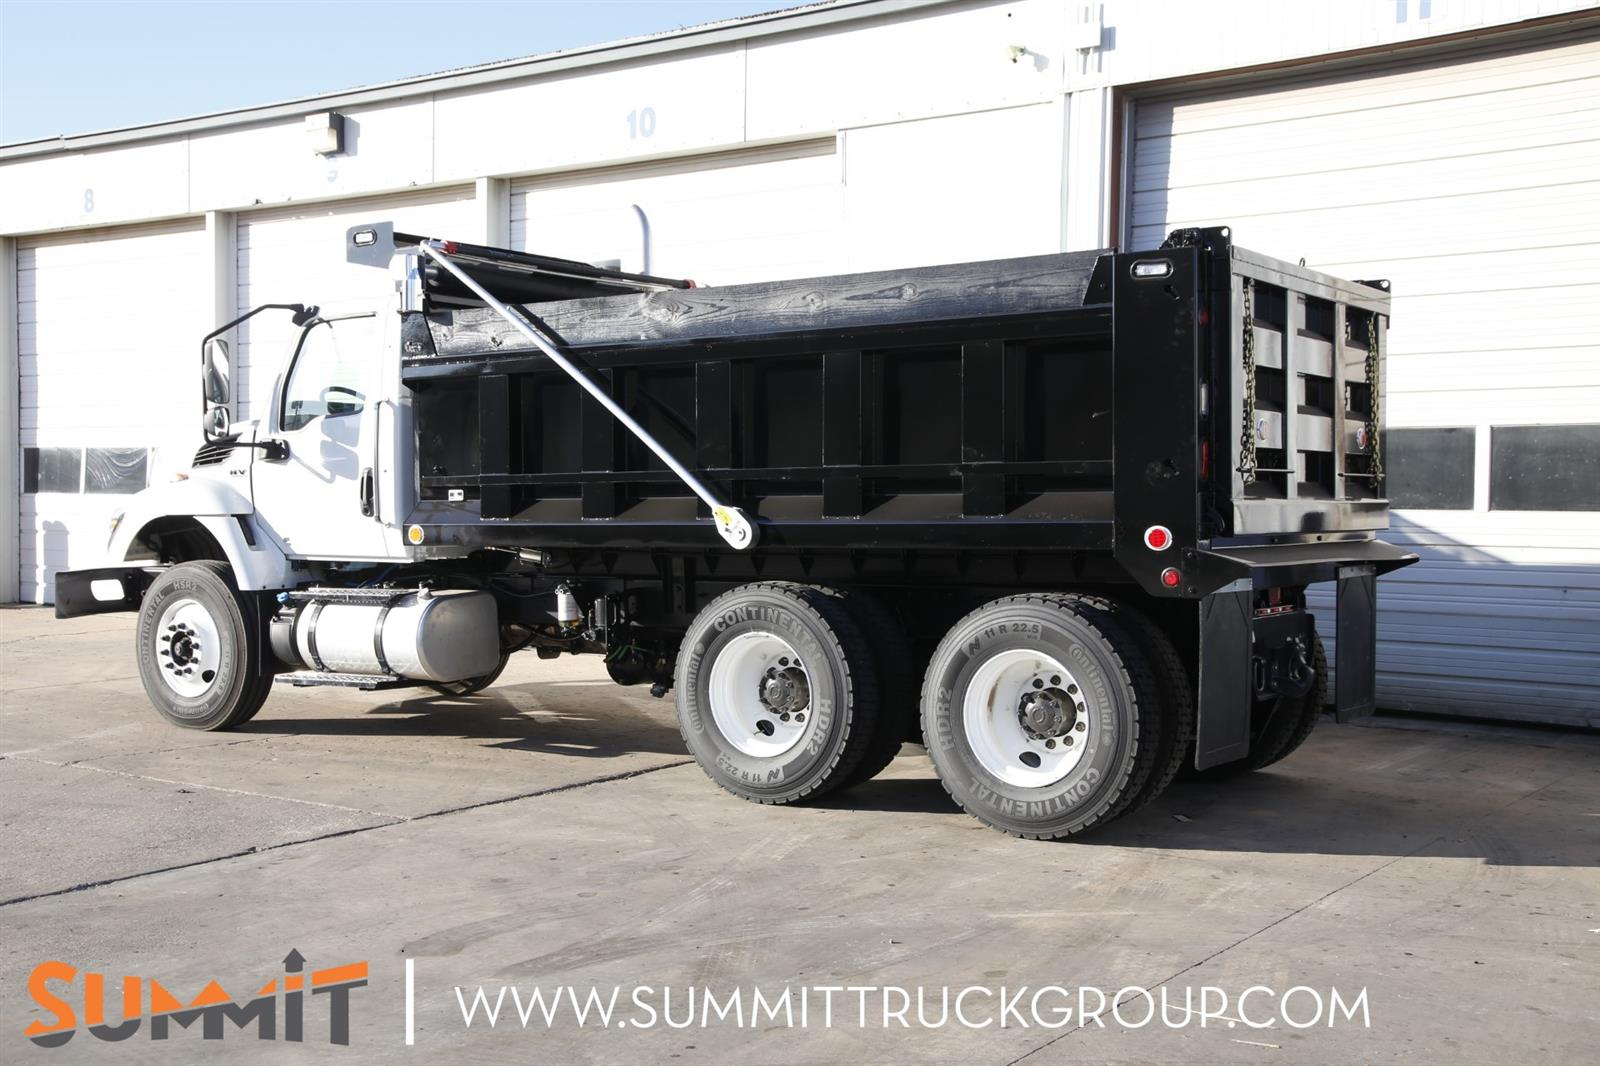 2020 International HV Regular Cab 6x4, Dump Body #LL867982 - photo 1